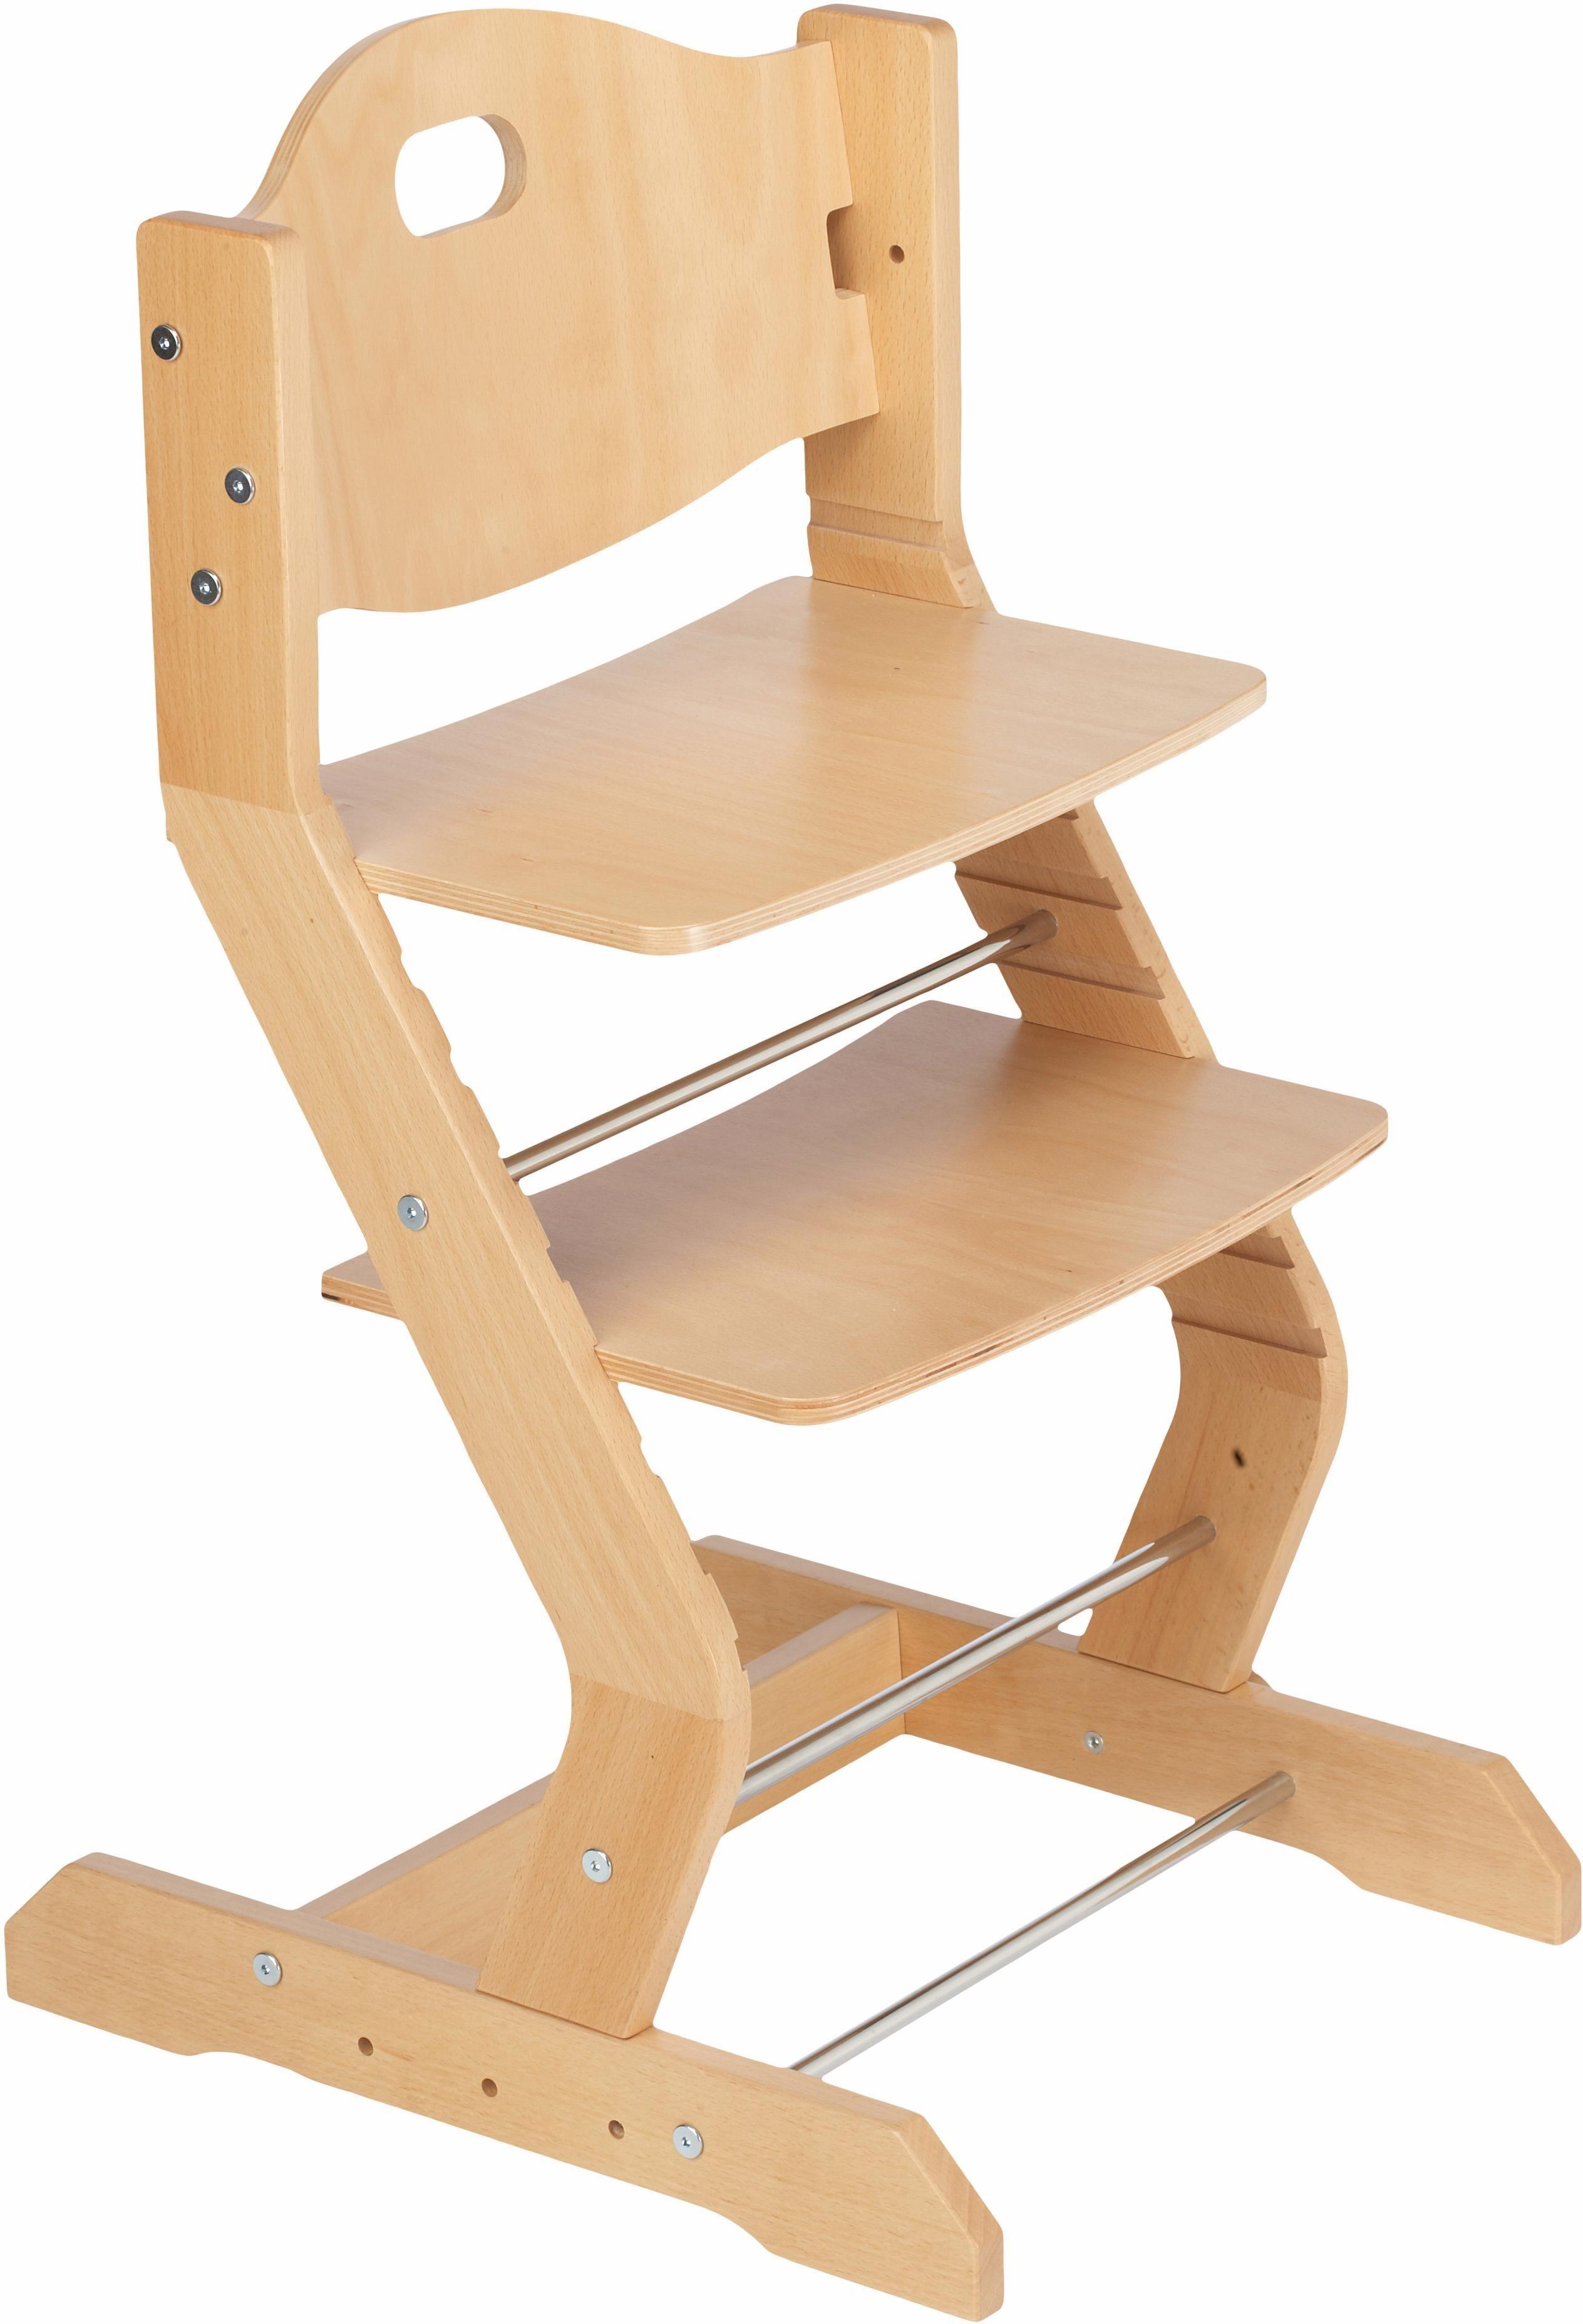 tiSsi® Hochstuhl aus Holz, »Grundgestell Buche Natur«   Kinderzimmer > Kinderzimmerstühle > Hochstühle   tiSsi®